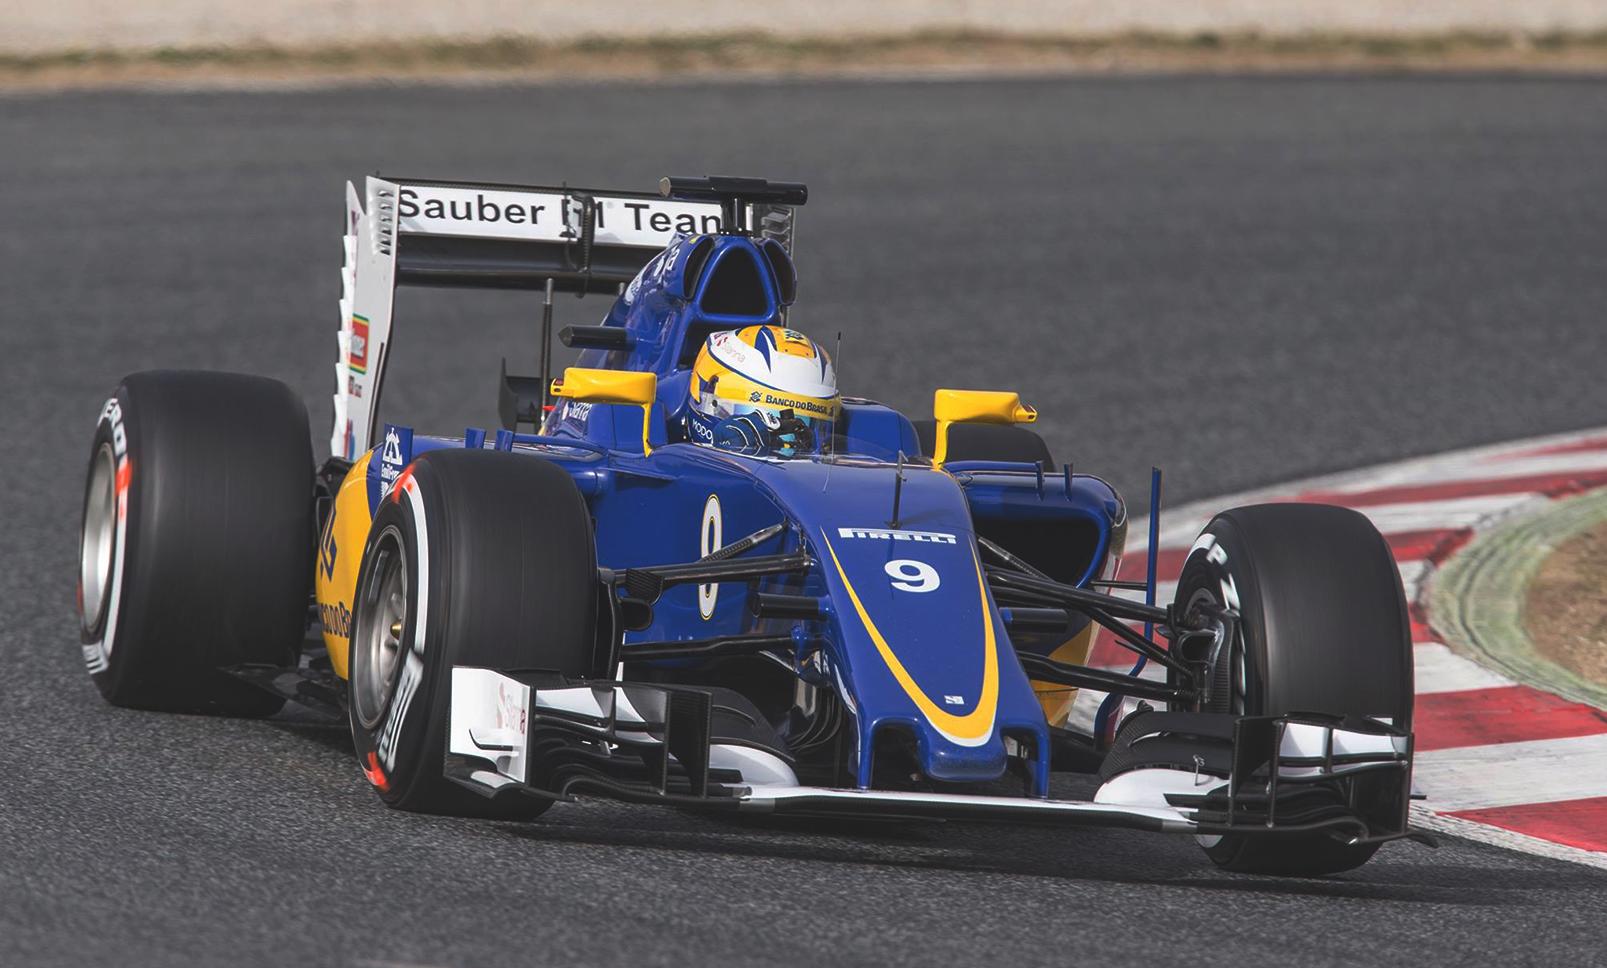 Marcus Ericsson i sin nya Sauber. Foto: Sauber/Facebook